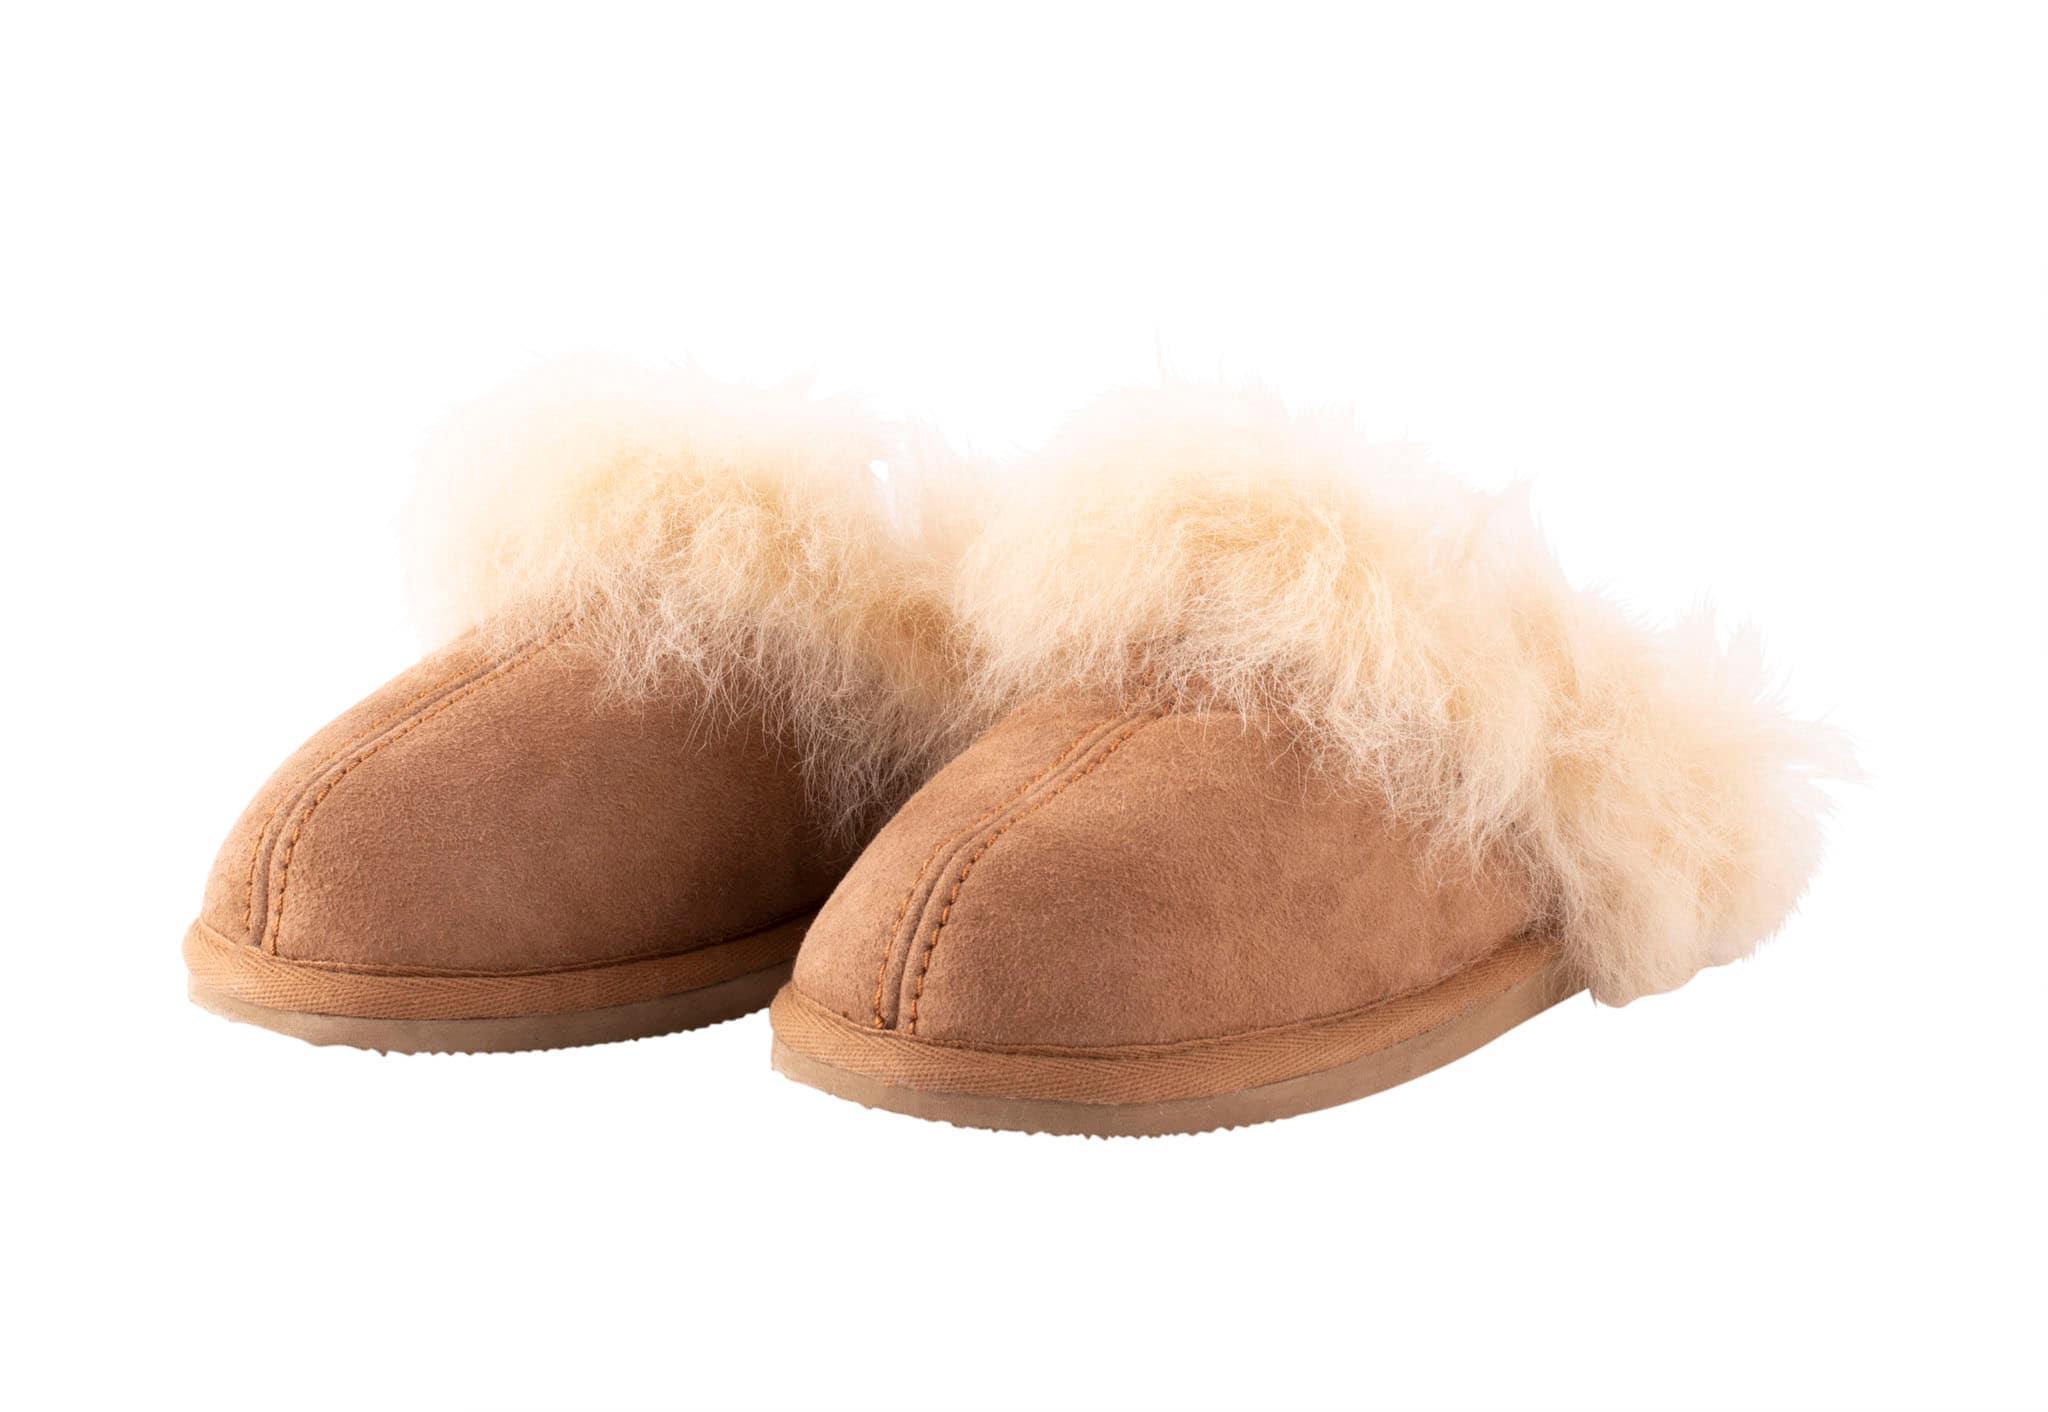 Evelina sheepskin slippers